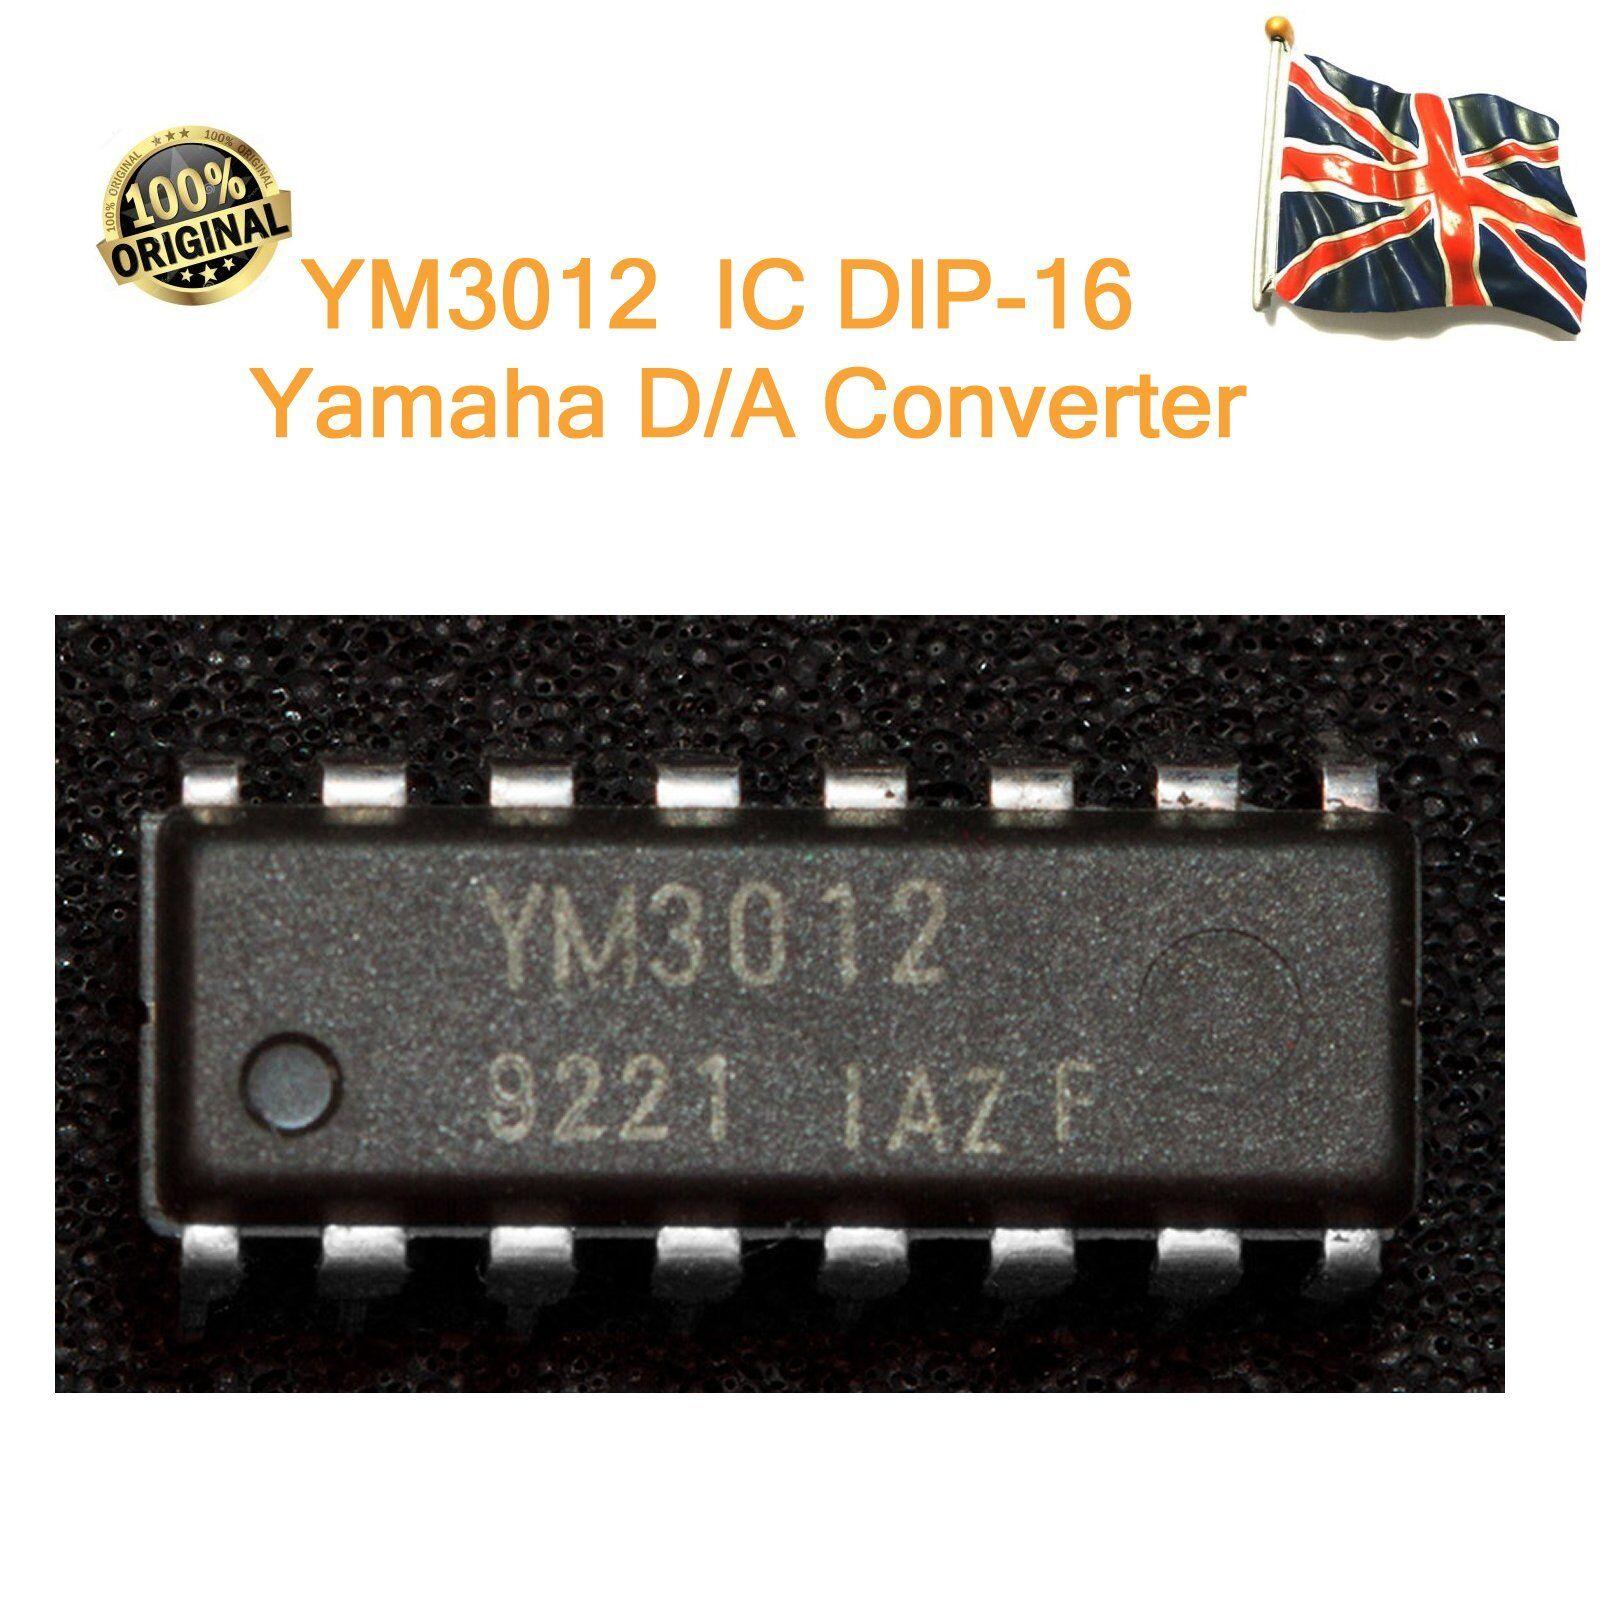 Ym3012 Integrated Circuit Case Dip16 Make Yamaha Ebay Lm358 Dip8 Norton Secured Powered By Verisign